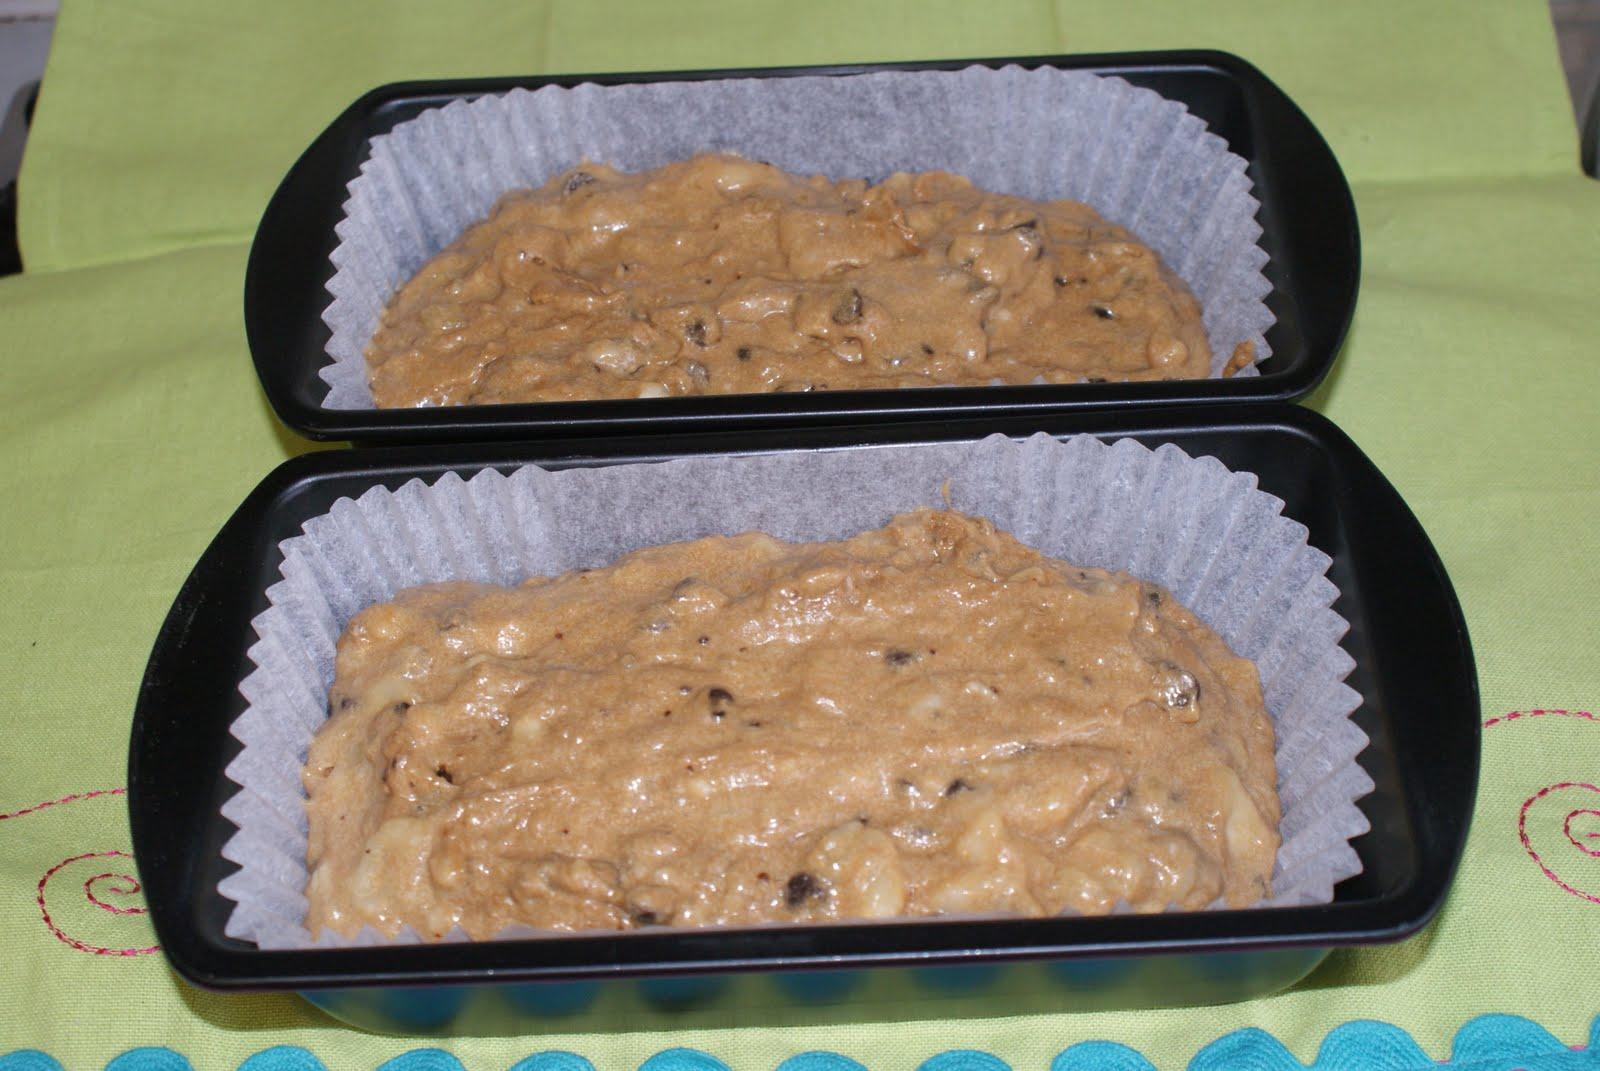 Cake Recipes Using Loaf Tin: Chocolate & Banana Loaf Cake